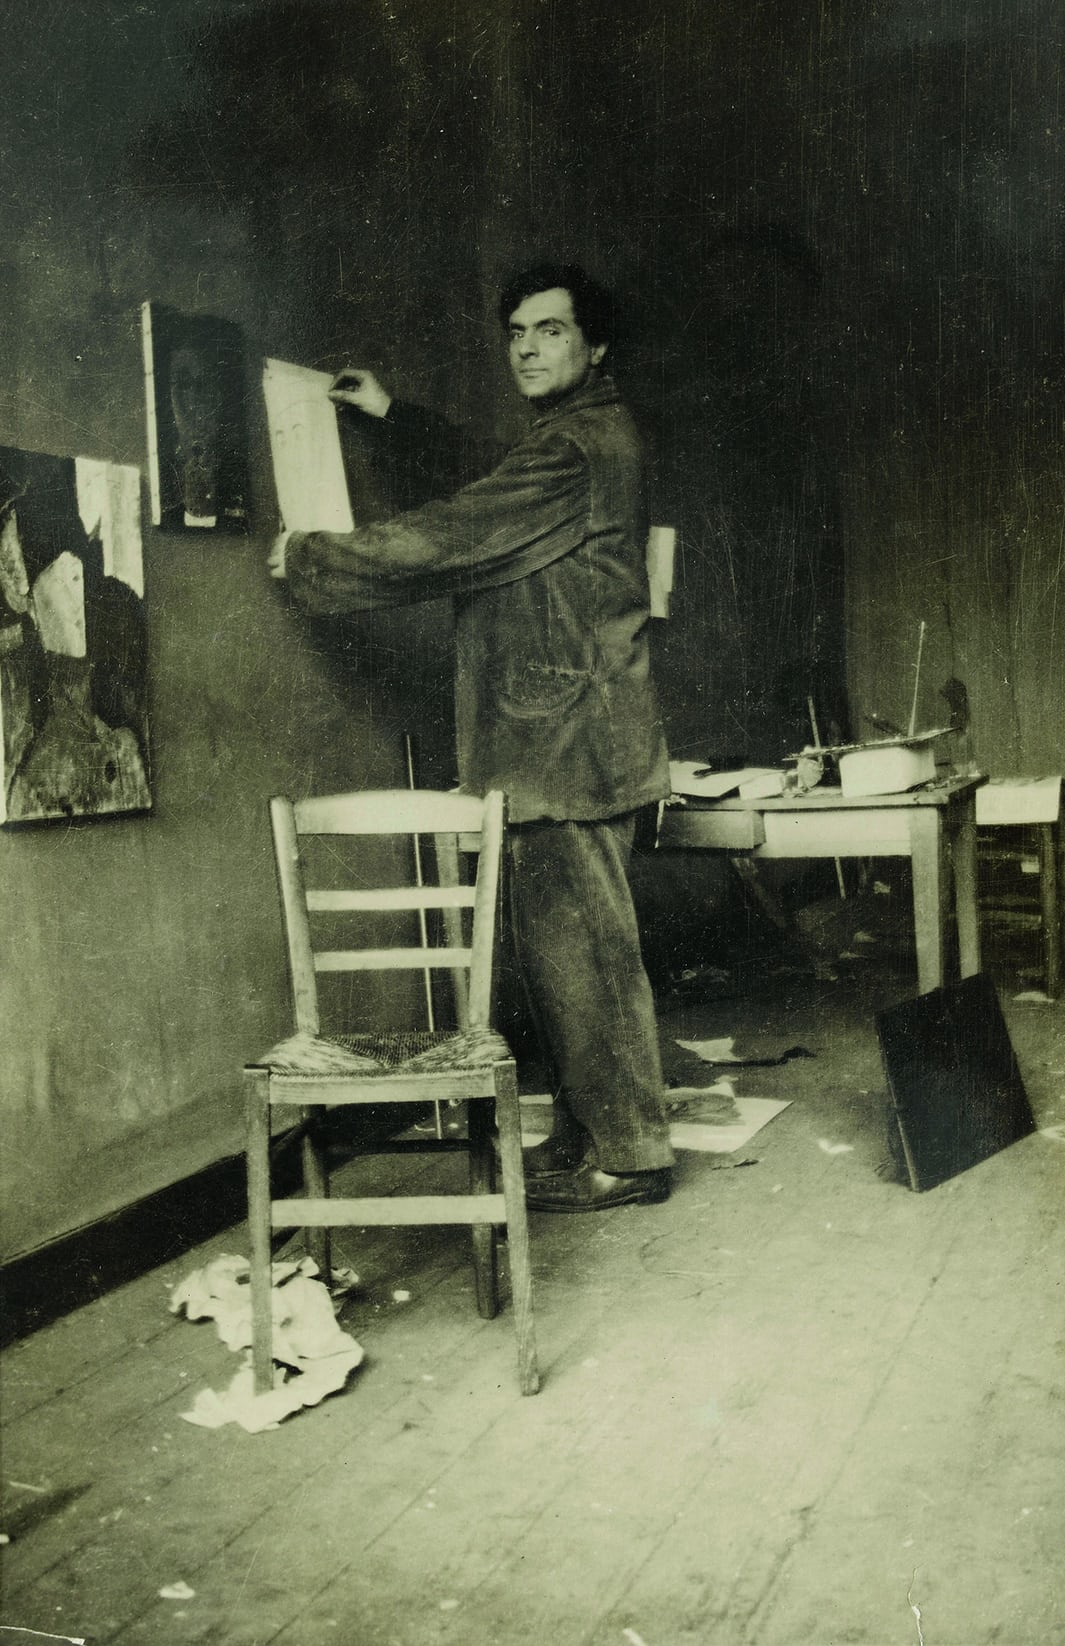 Modigliani in his studio, photographed by Paul Guillaume, c1915. Photograph: © RMN-Grand Palais (Musée de l'Orangerie)